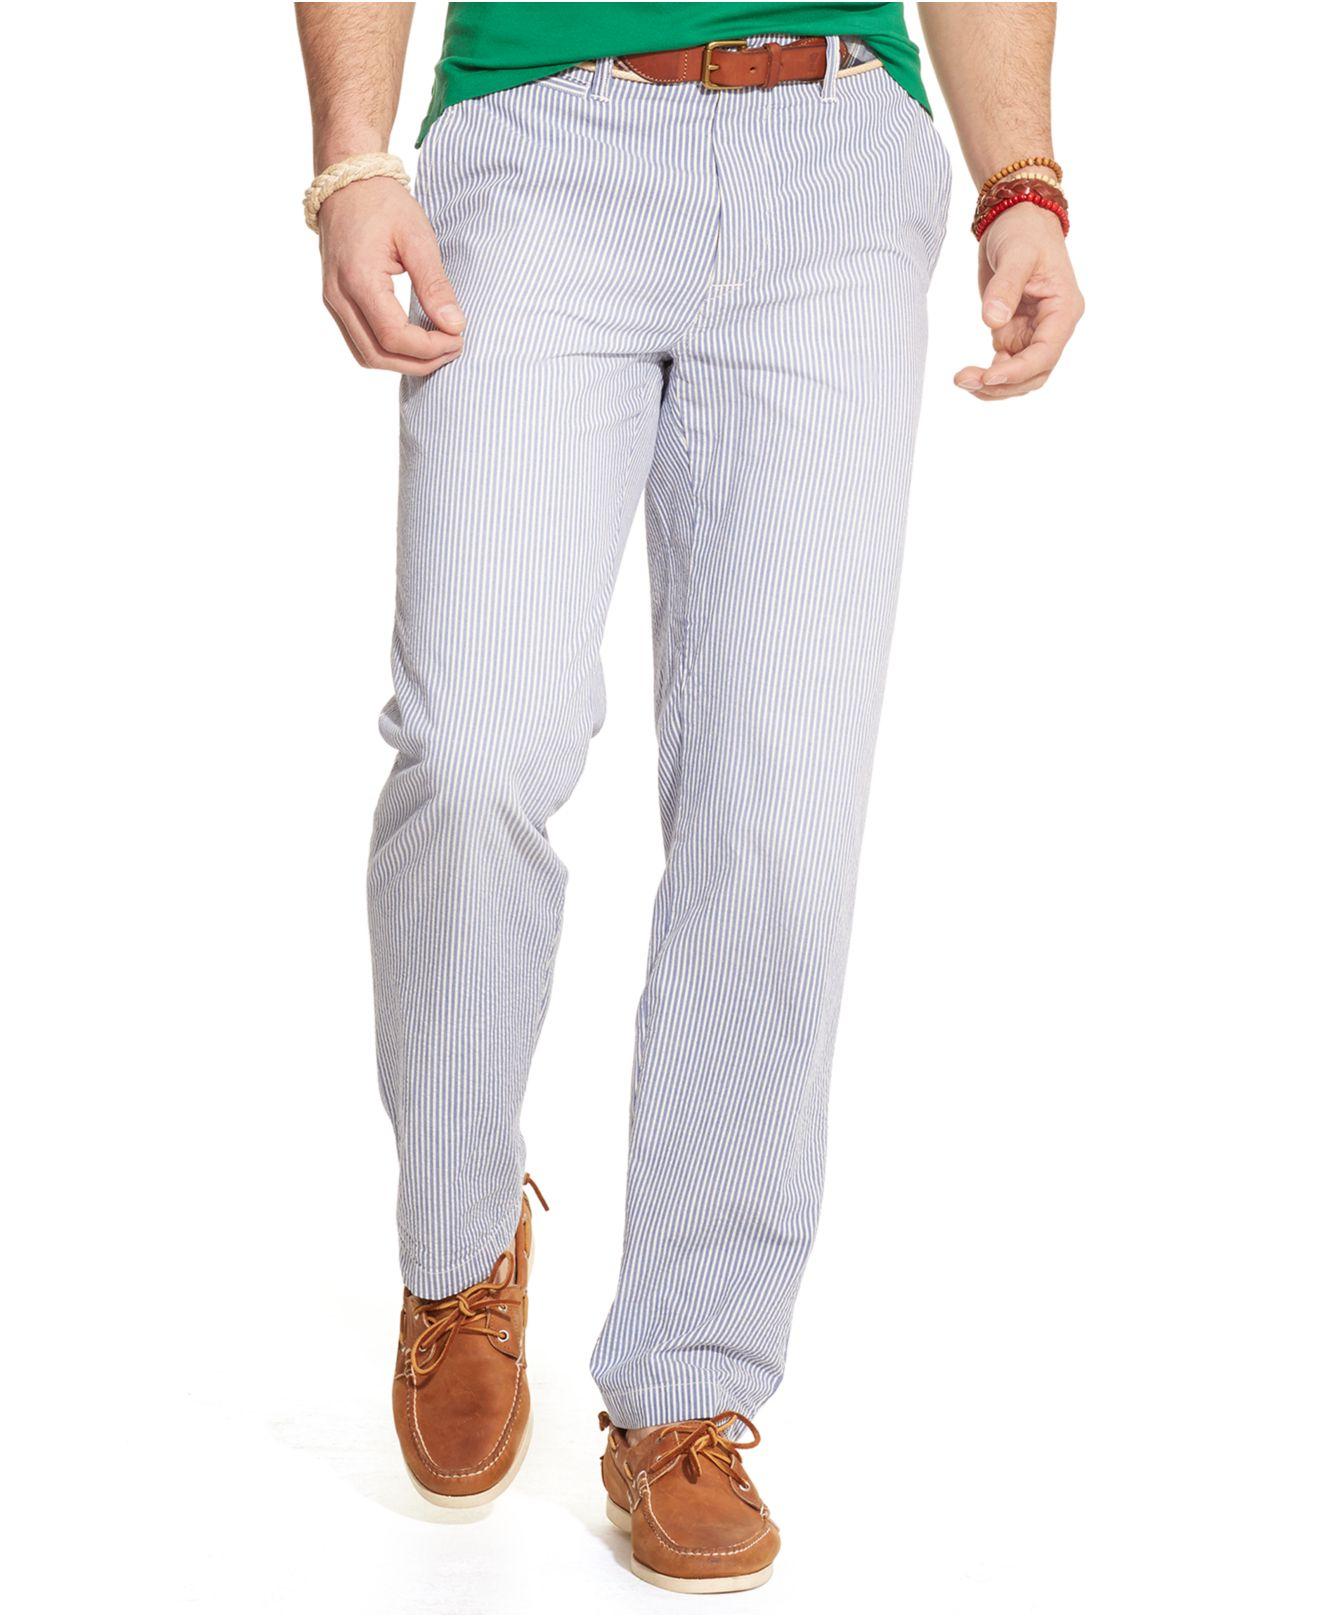 30562fd0e Polo Ralph Lauren Classic-Fit Maritime Seersucker Pants in Blue for ...